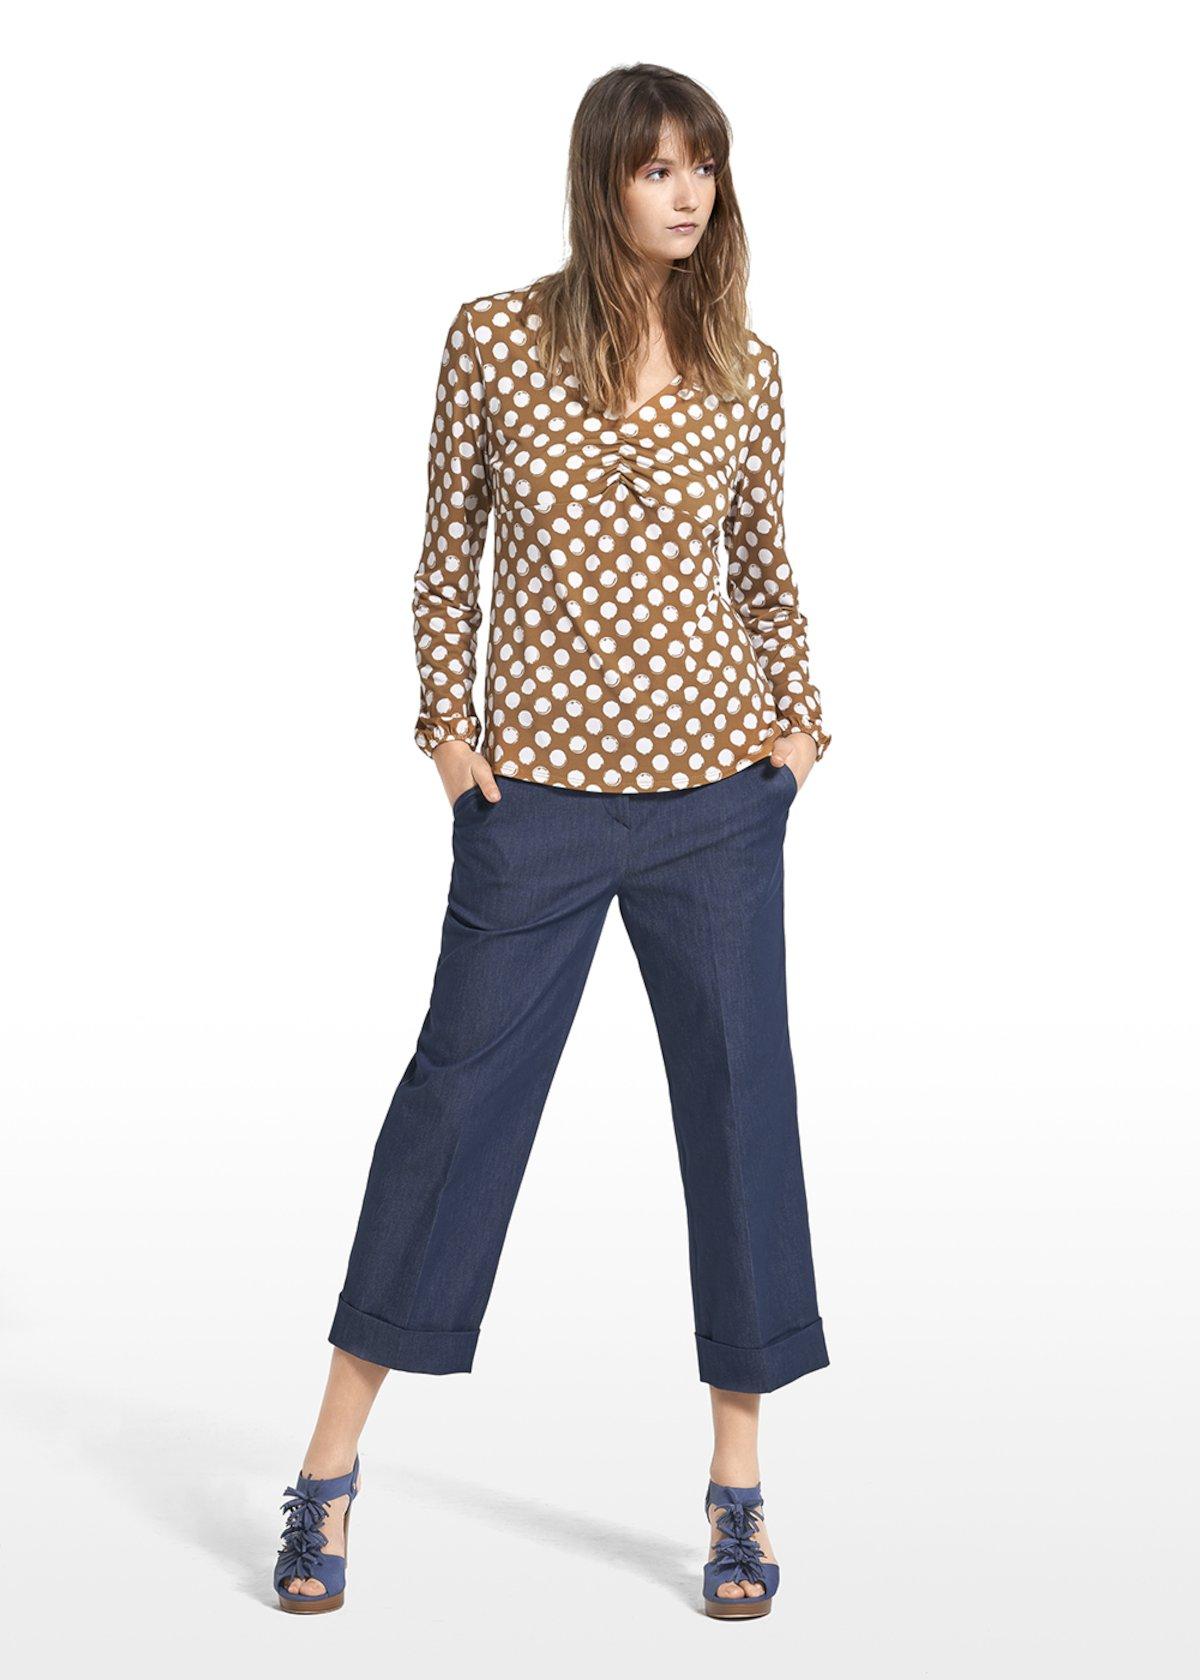 Patterned polka dot on honey-bottom sewater Susan - Miele / White Pois - Woman - Category image